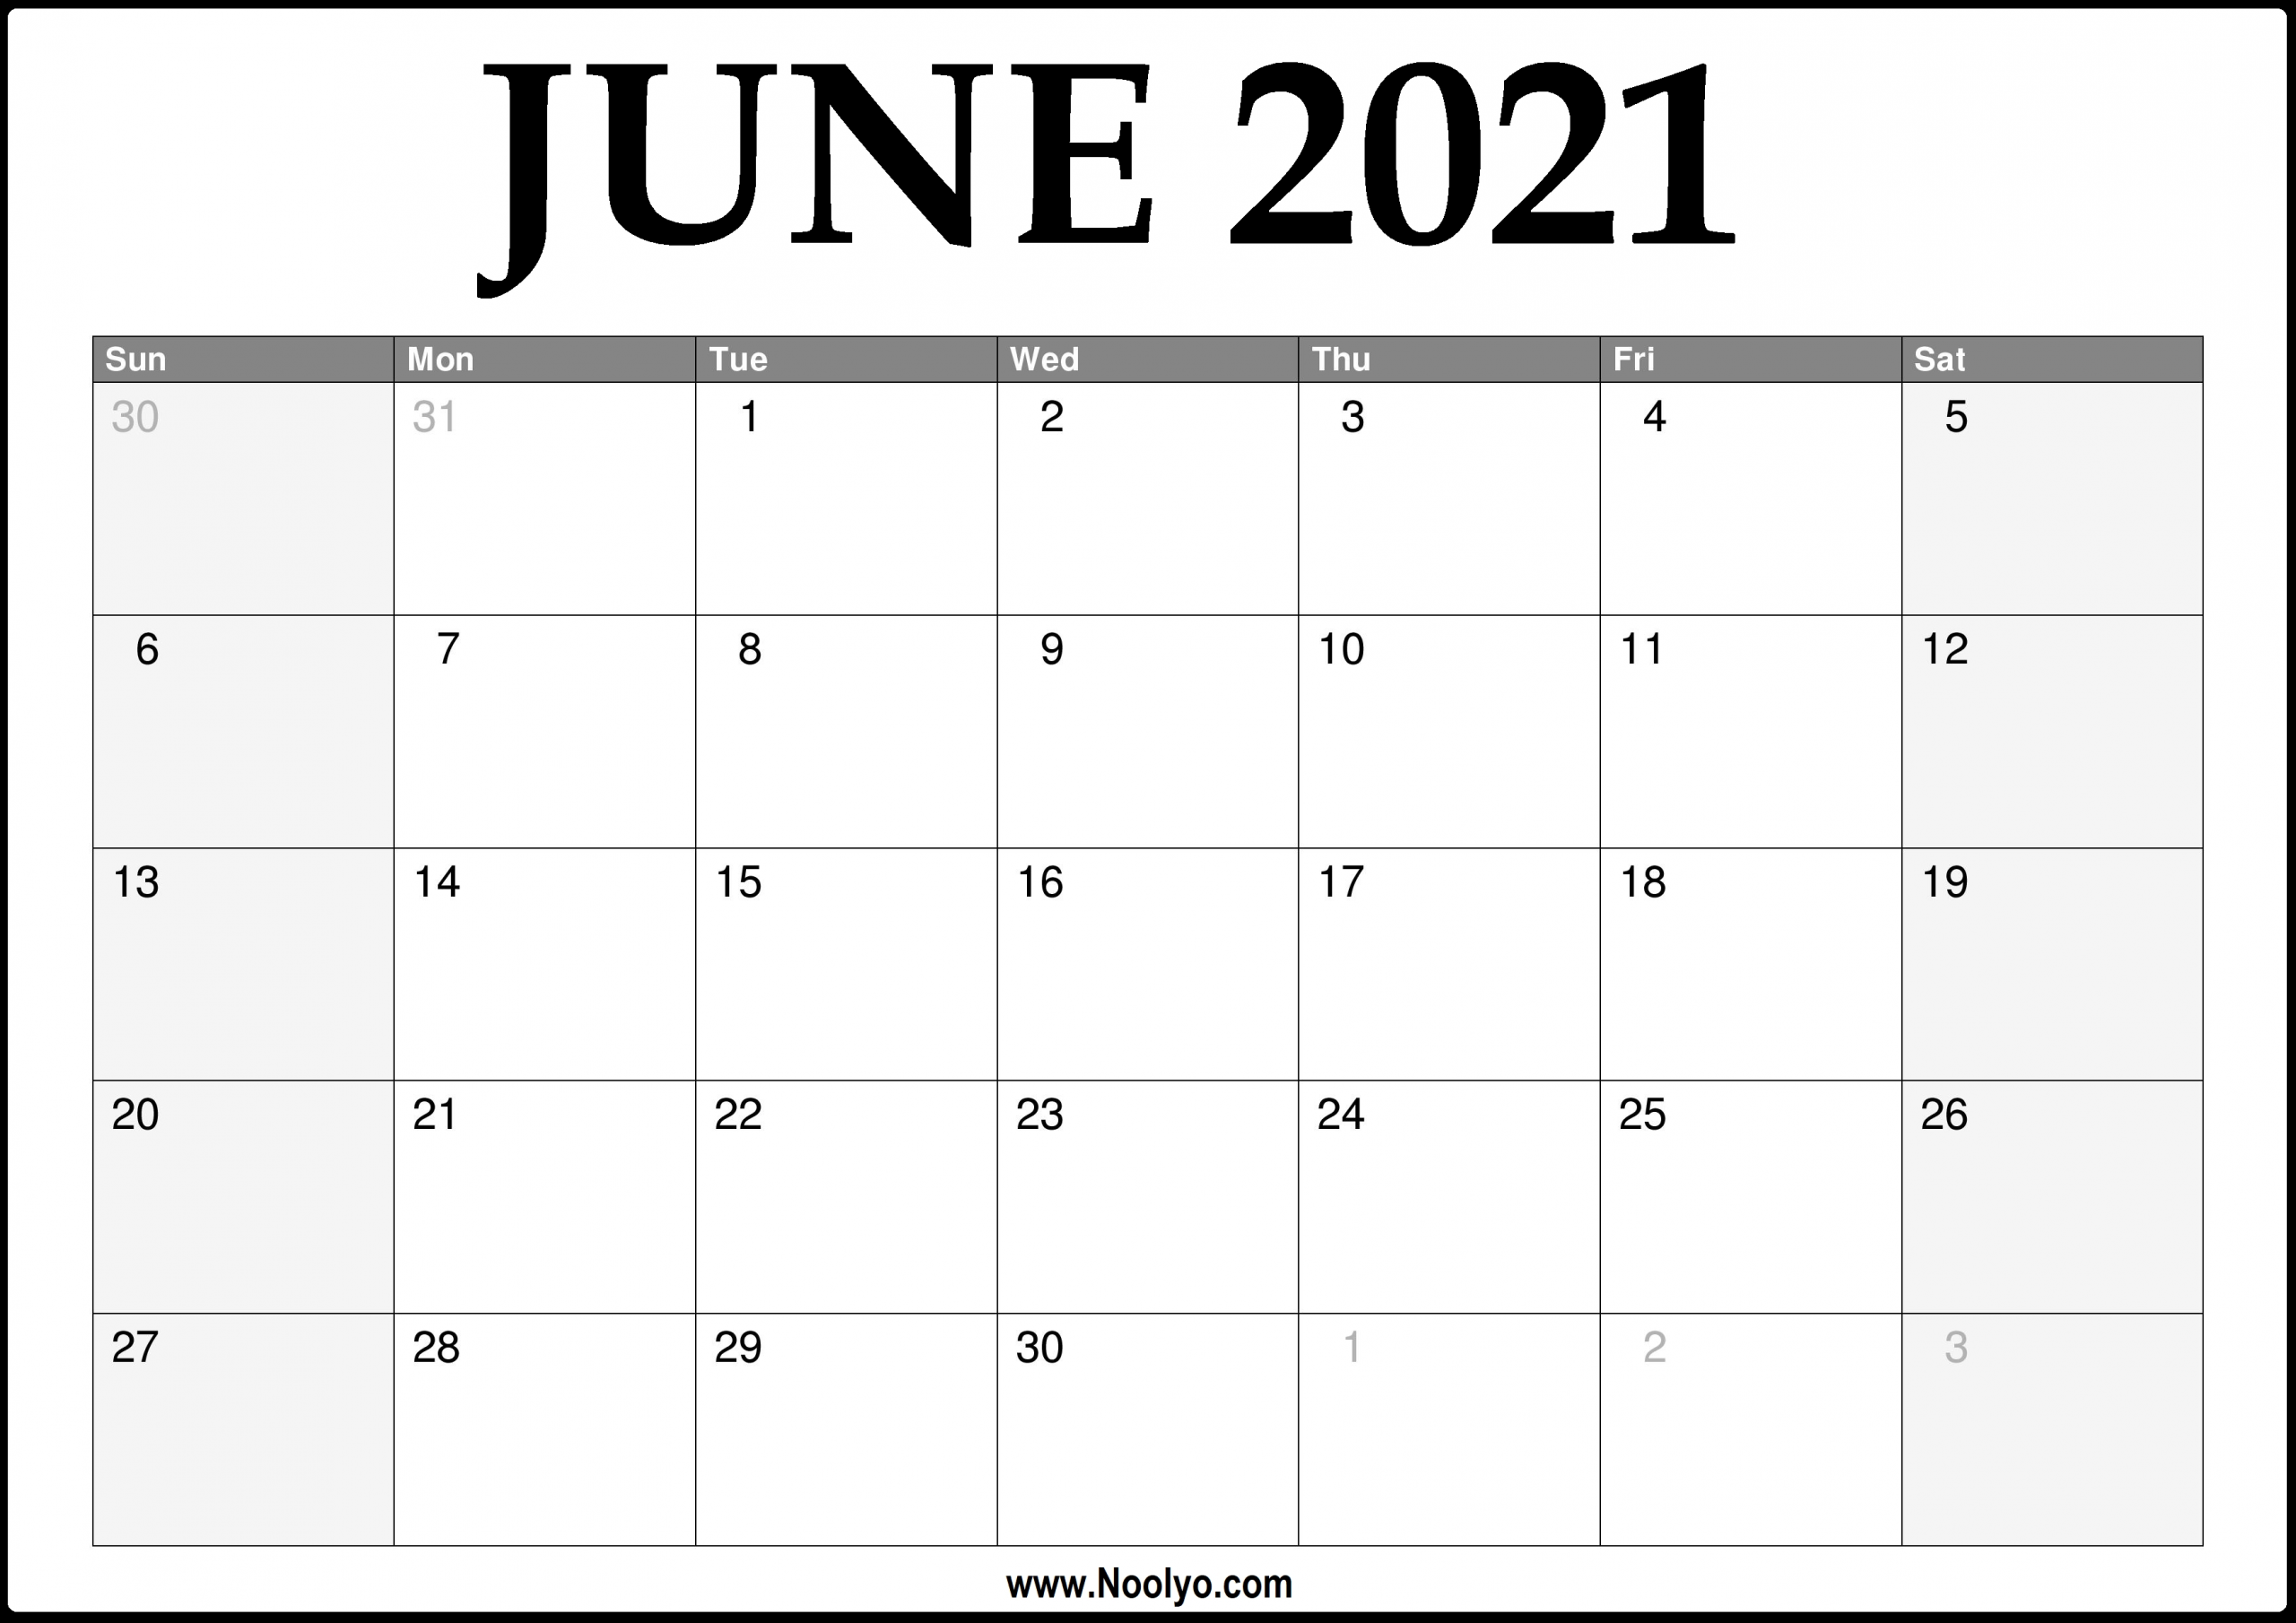 2021 June Calendar Printable – Download Free – Noolyo-Print Free 2021 Calendar Without Downloading